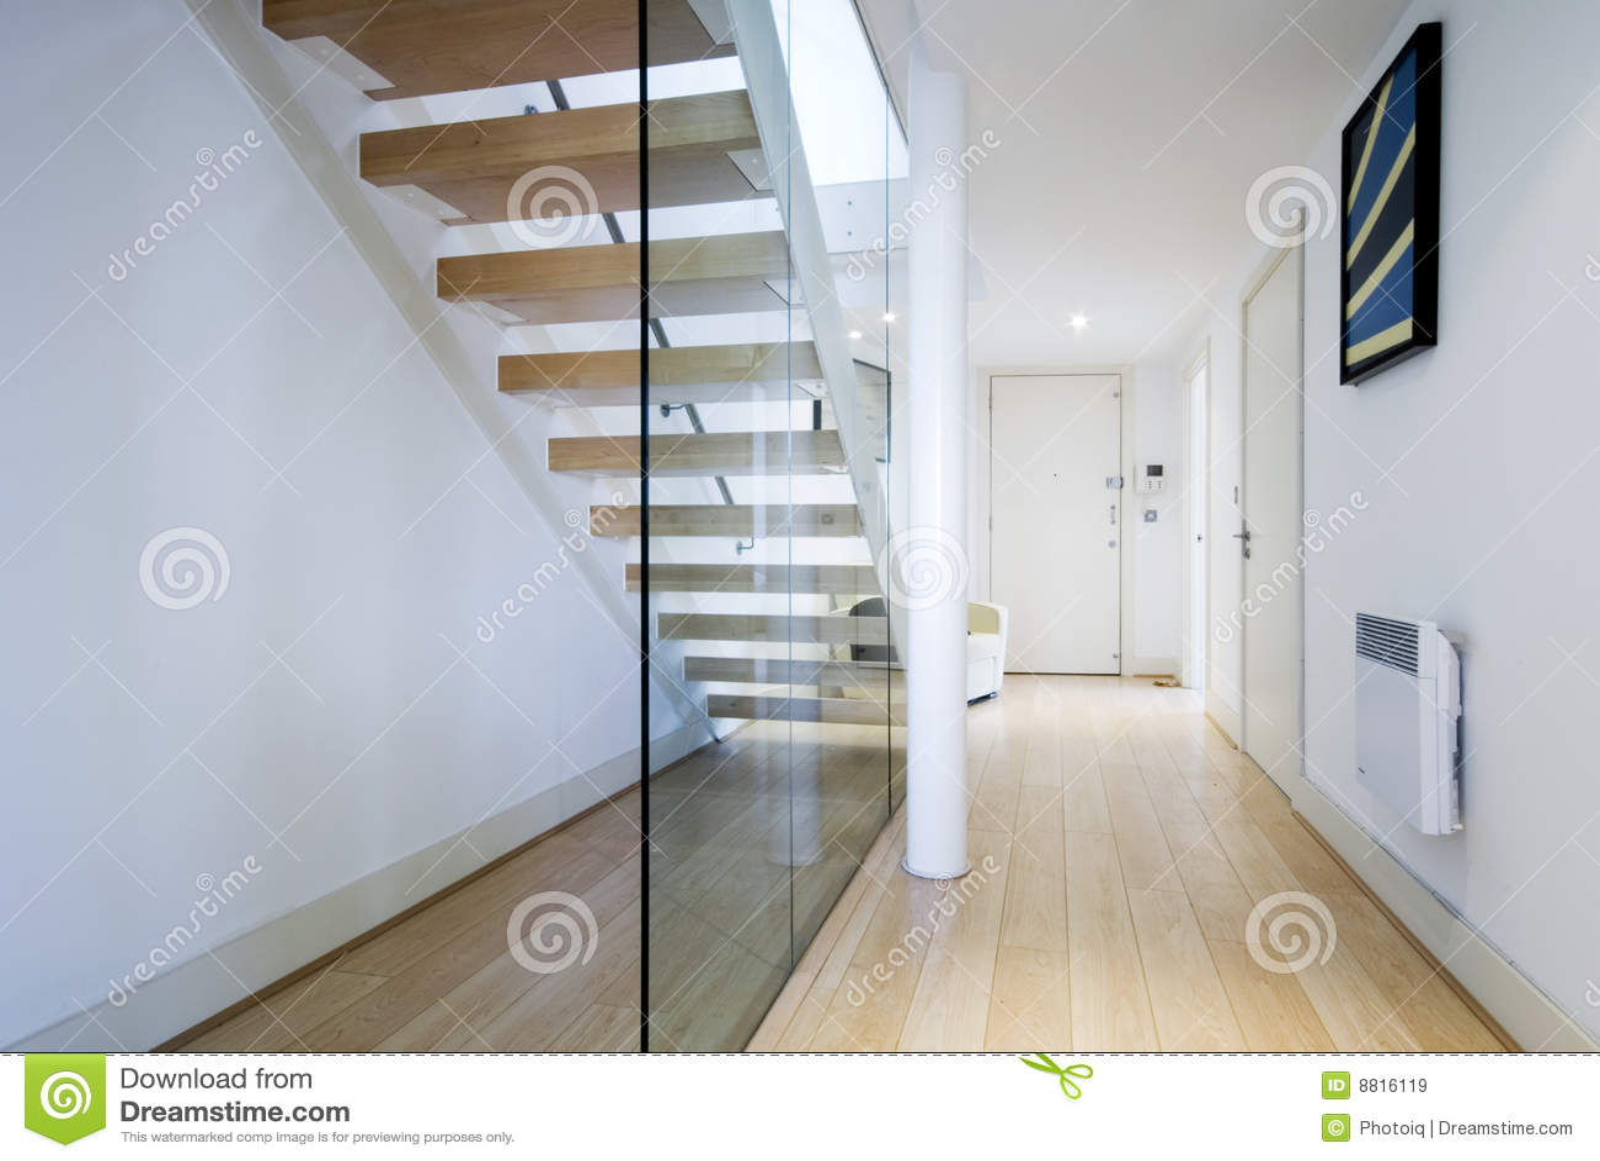 Hal met trap stock afbeelding afbeelding bestaande uit canvas 8816119 - Hal ingang ontwerp ...